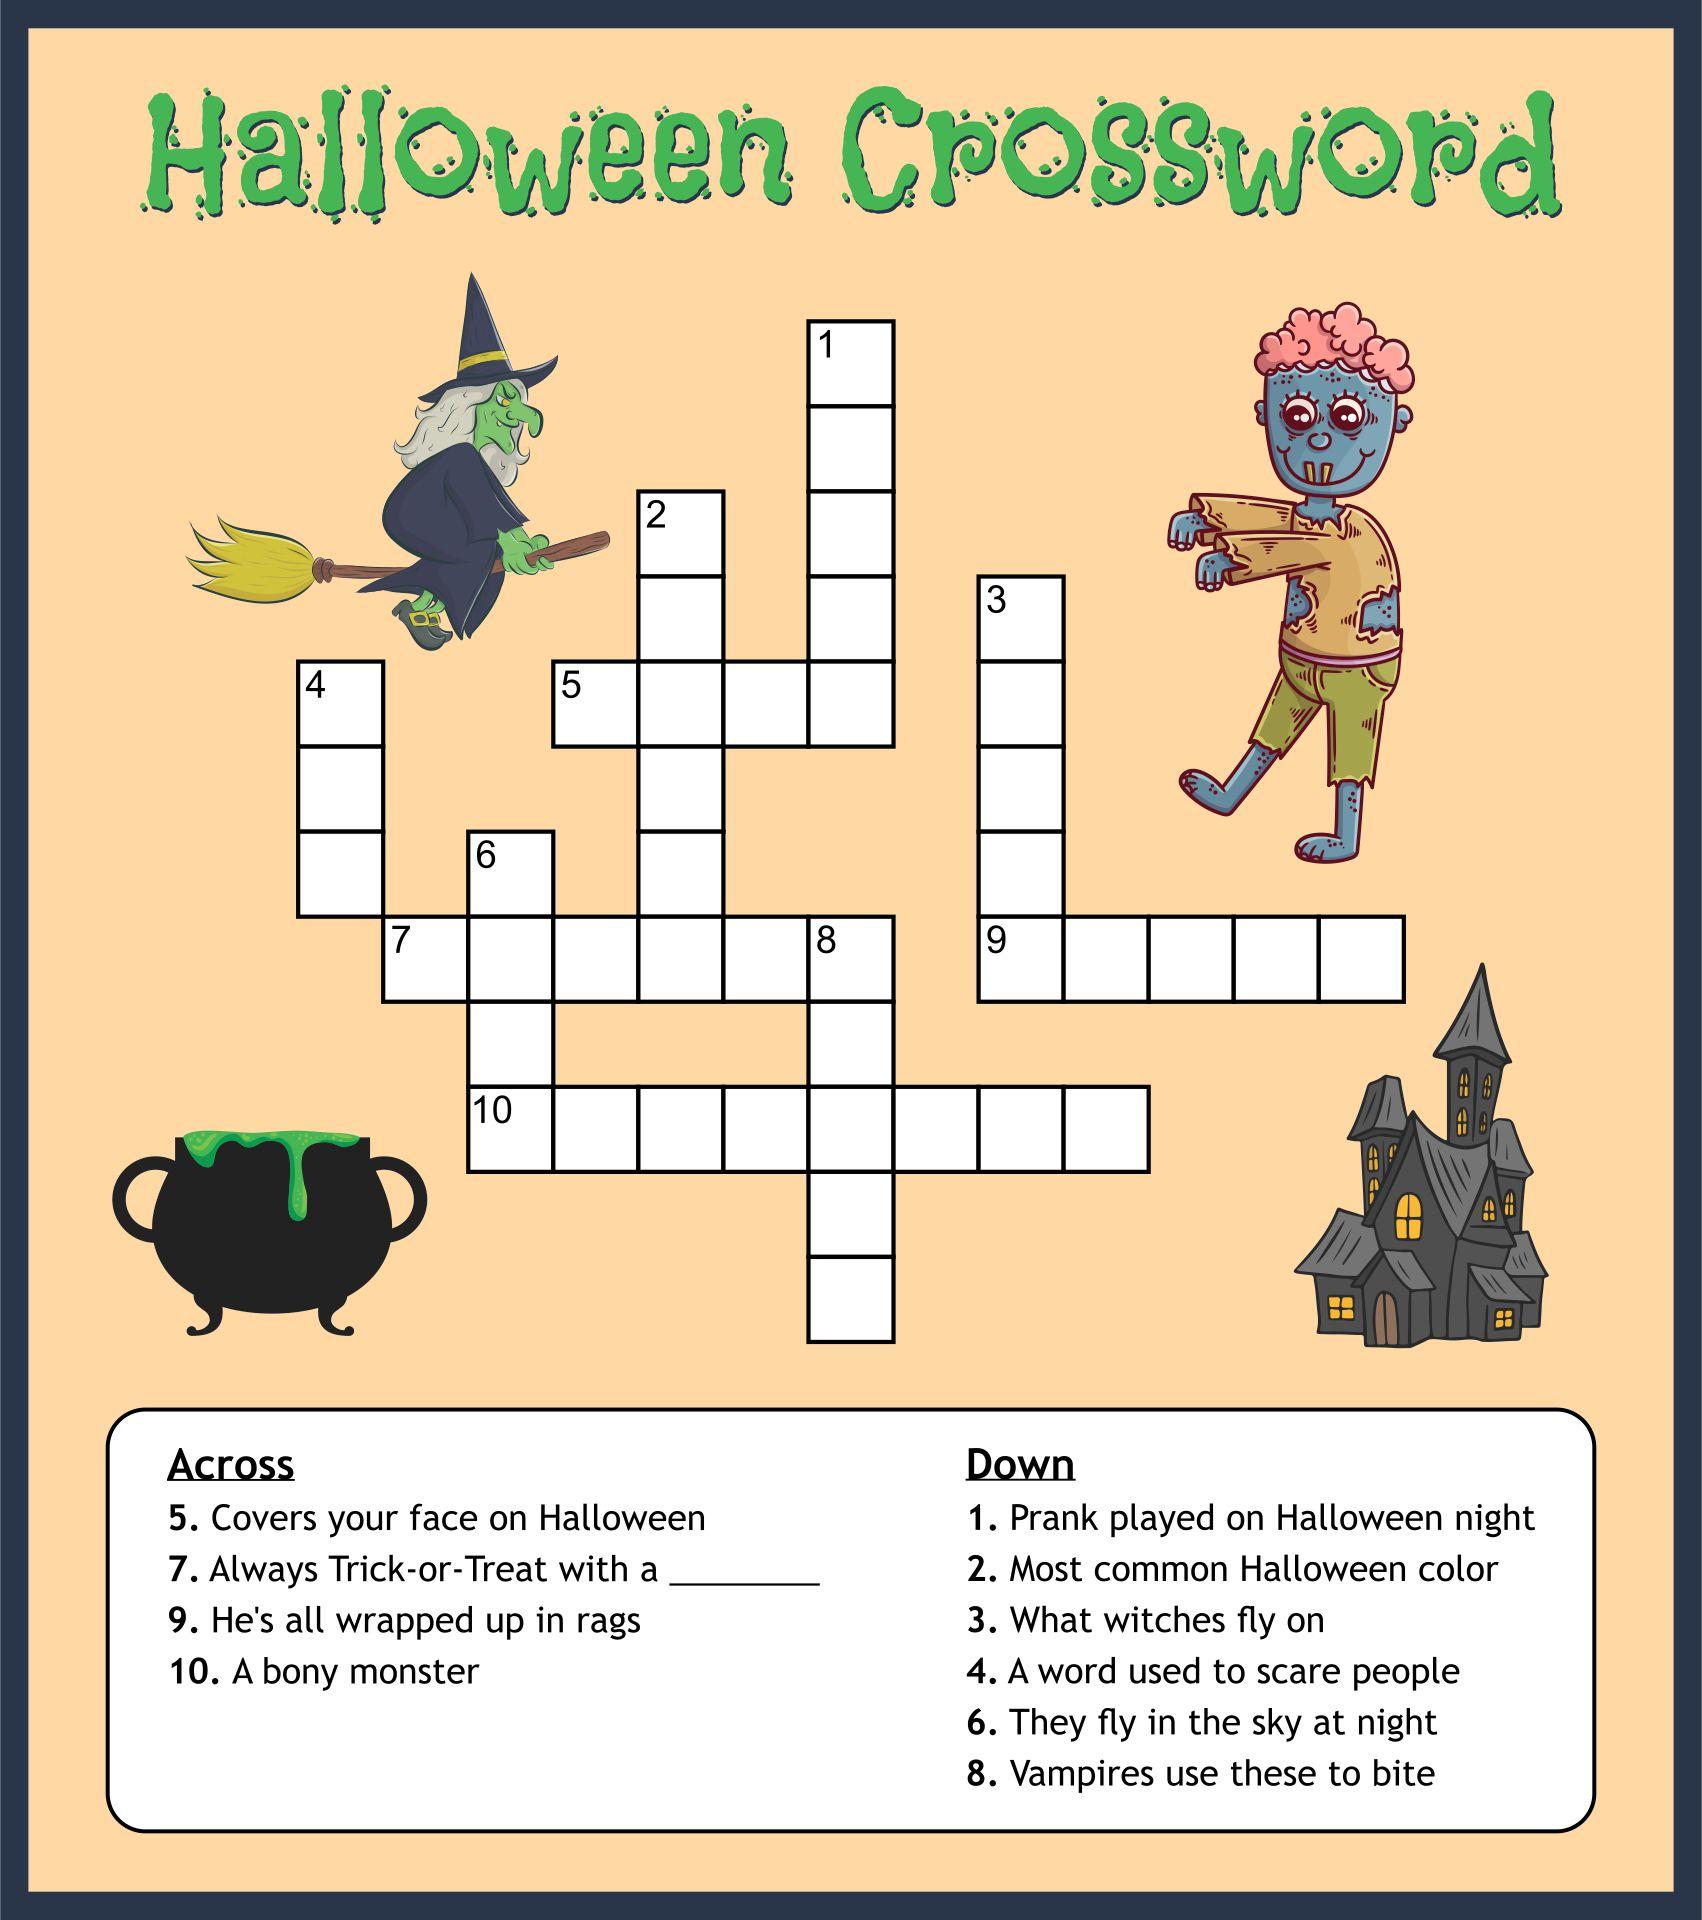 Easy Halloween Crossword Puzzles